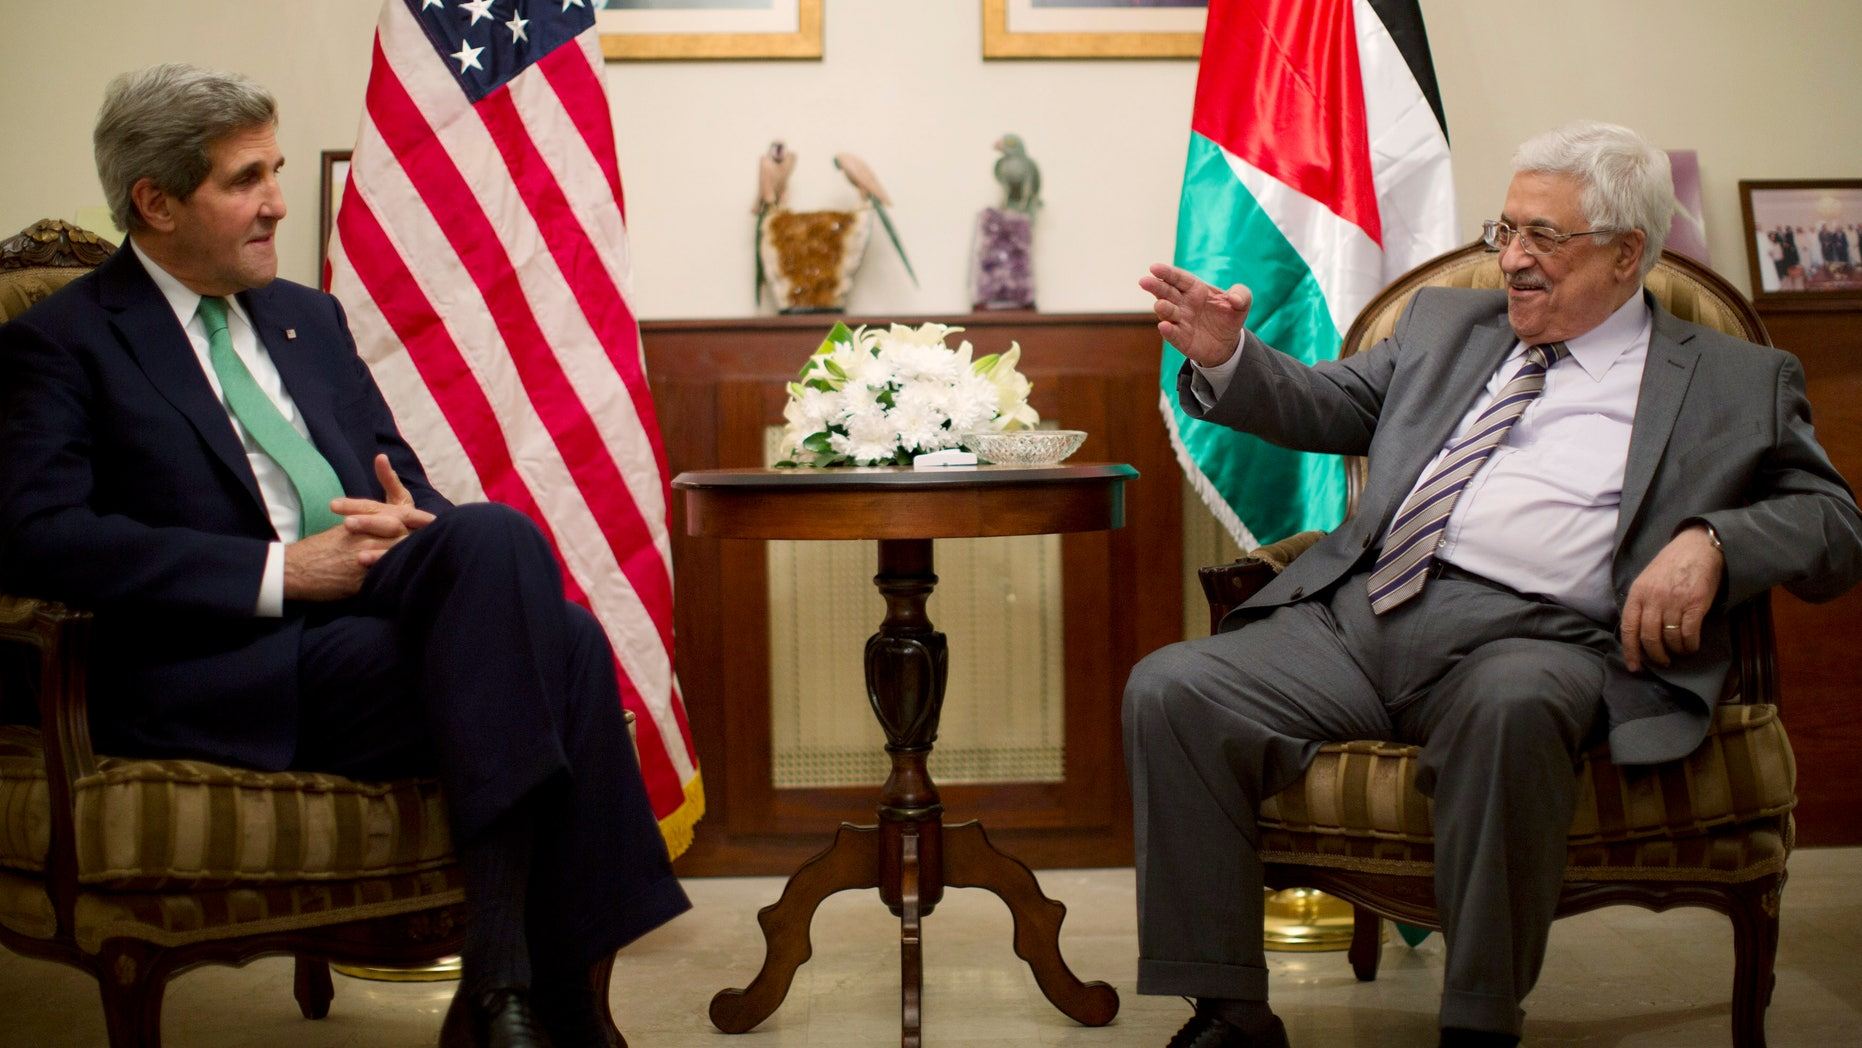 U.S. Secretary of State John Kerry, left, meets with Palestinian President President Mahmoud Abbas in Amman, Jordan, Thursday, Nov. 7, 2013. (AP Photo/Jason Reed, Pool)